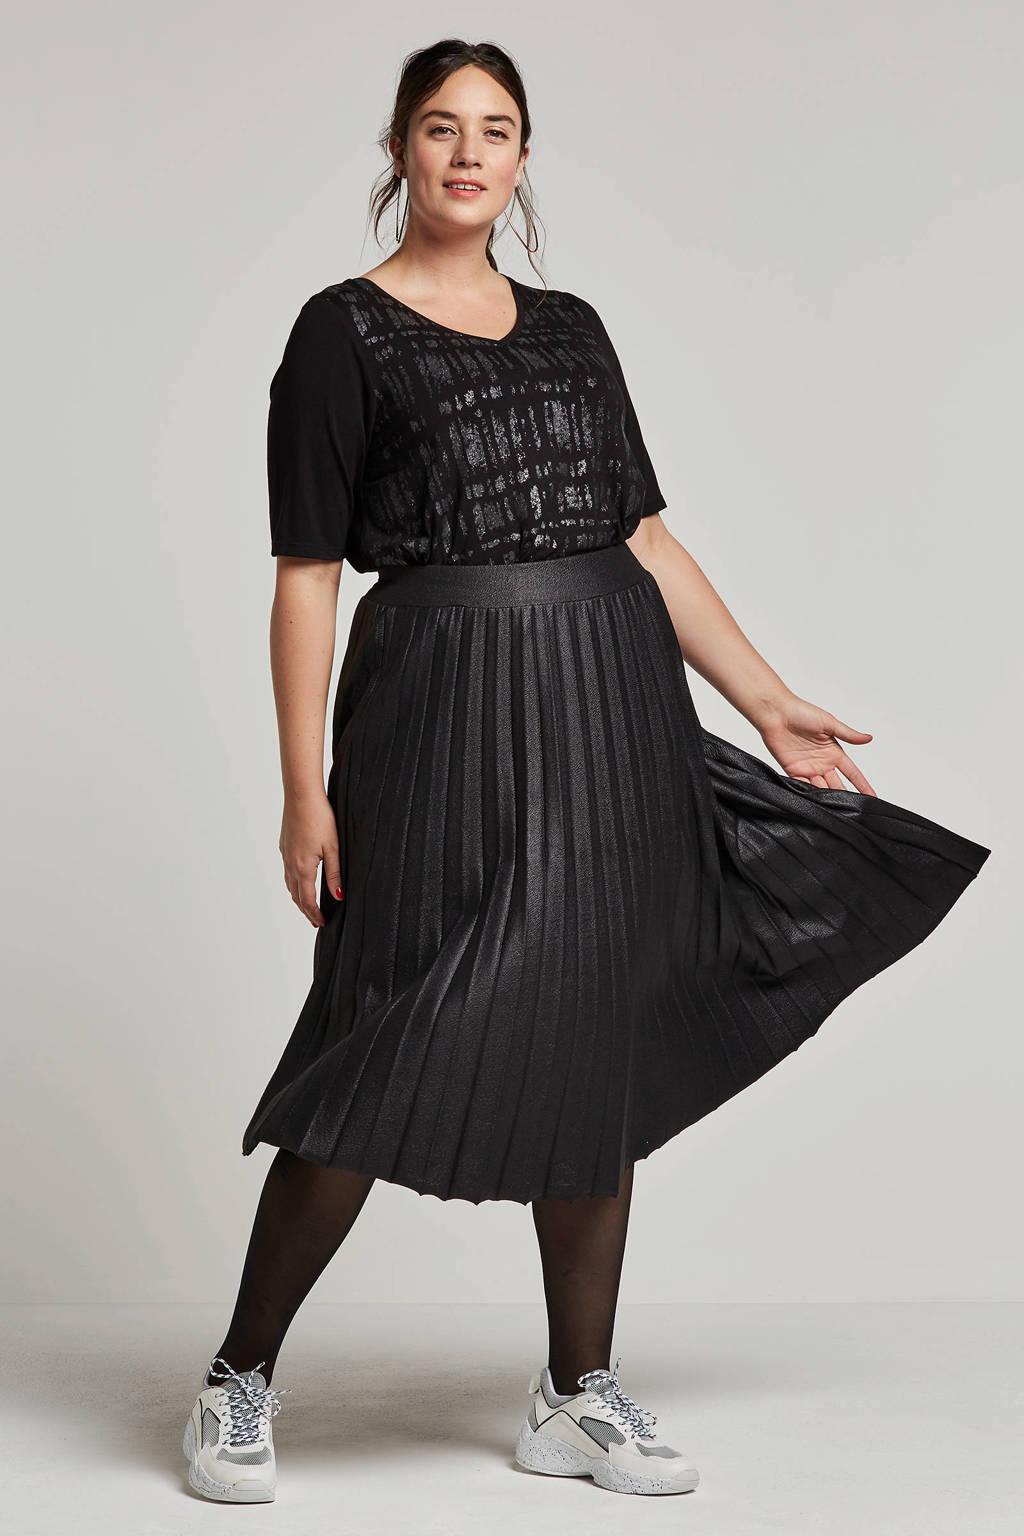 Zhenzi t-shirt met printopdruk, Zwart